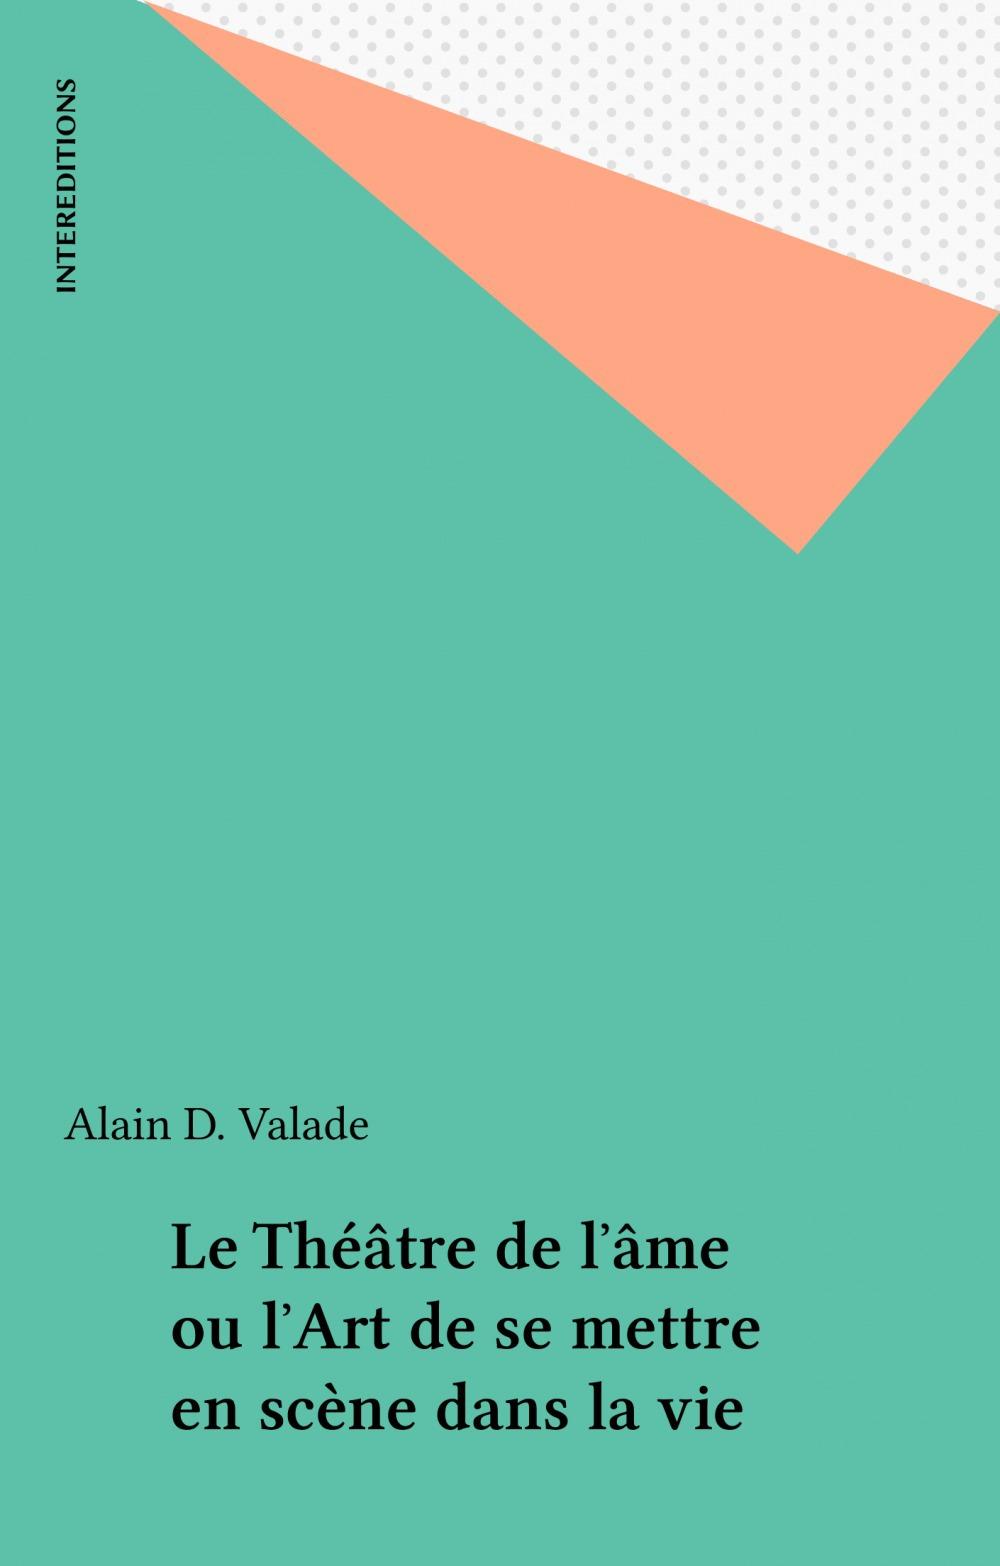 Le theatre de l'ame